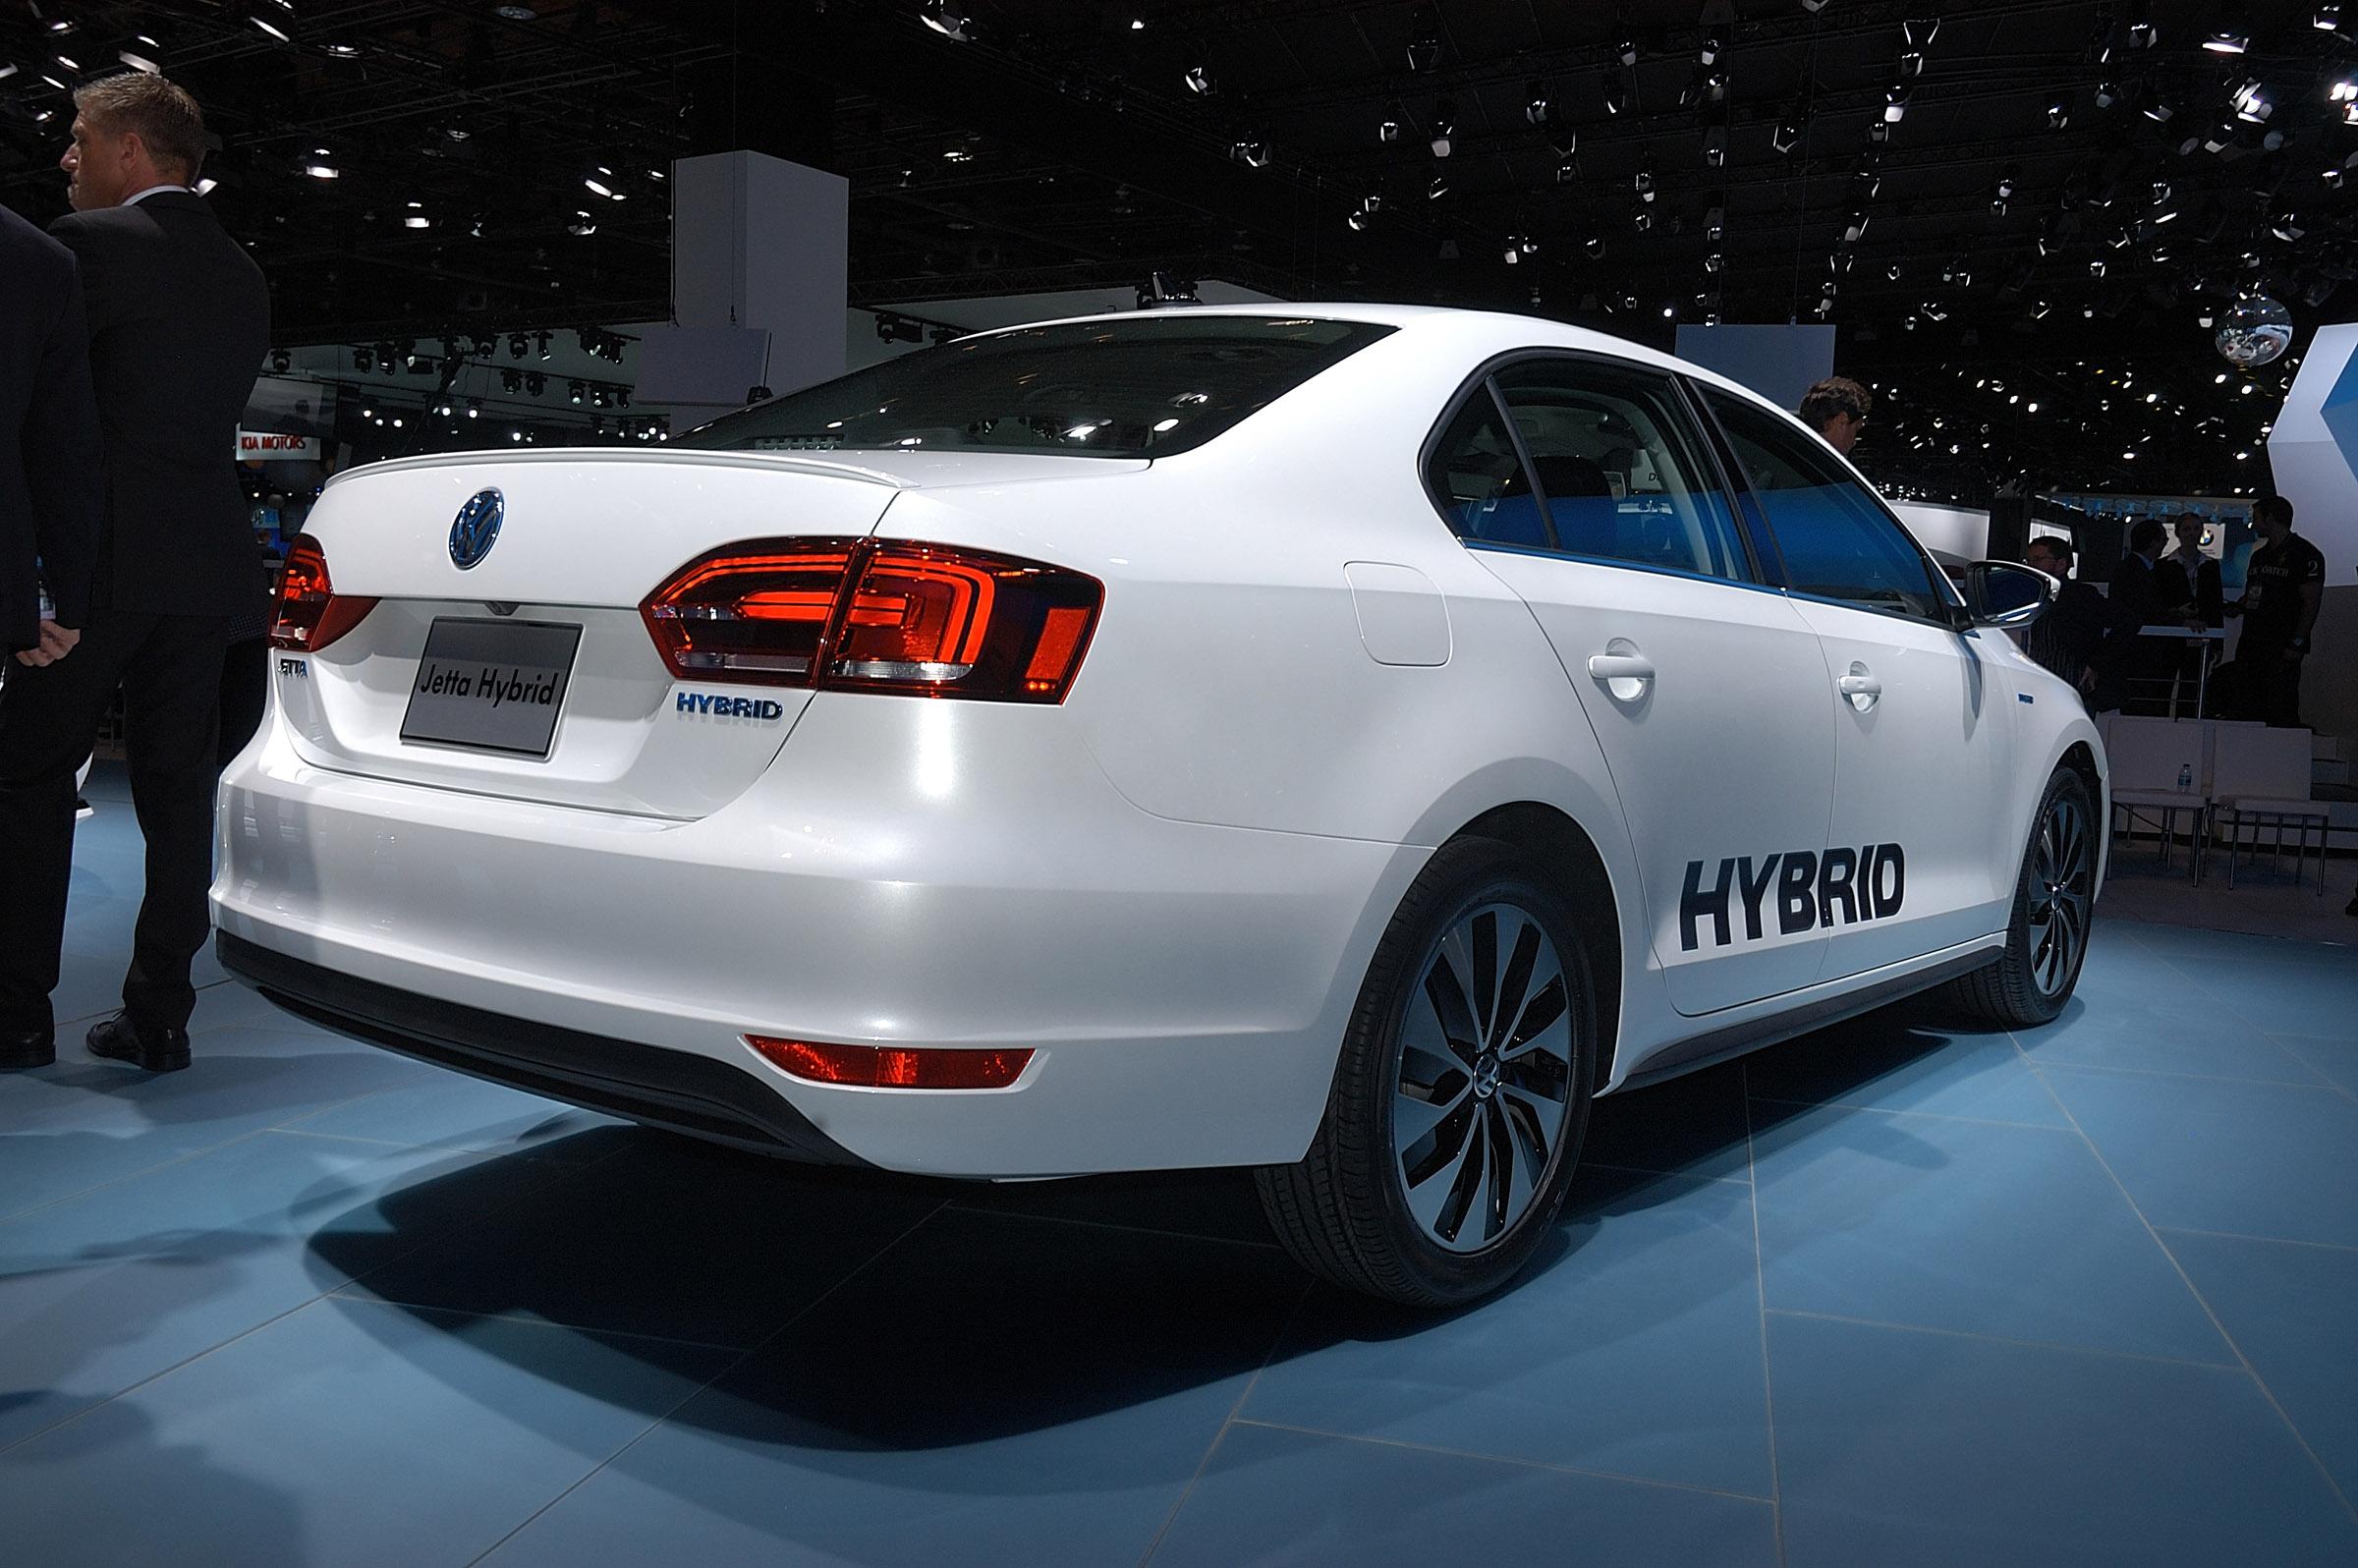 Jetta Tsi Review >> 2012 Volkswagen Jetta Hybrid